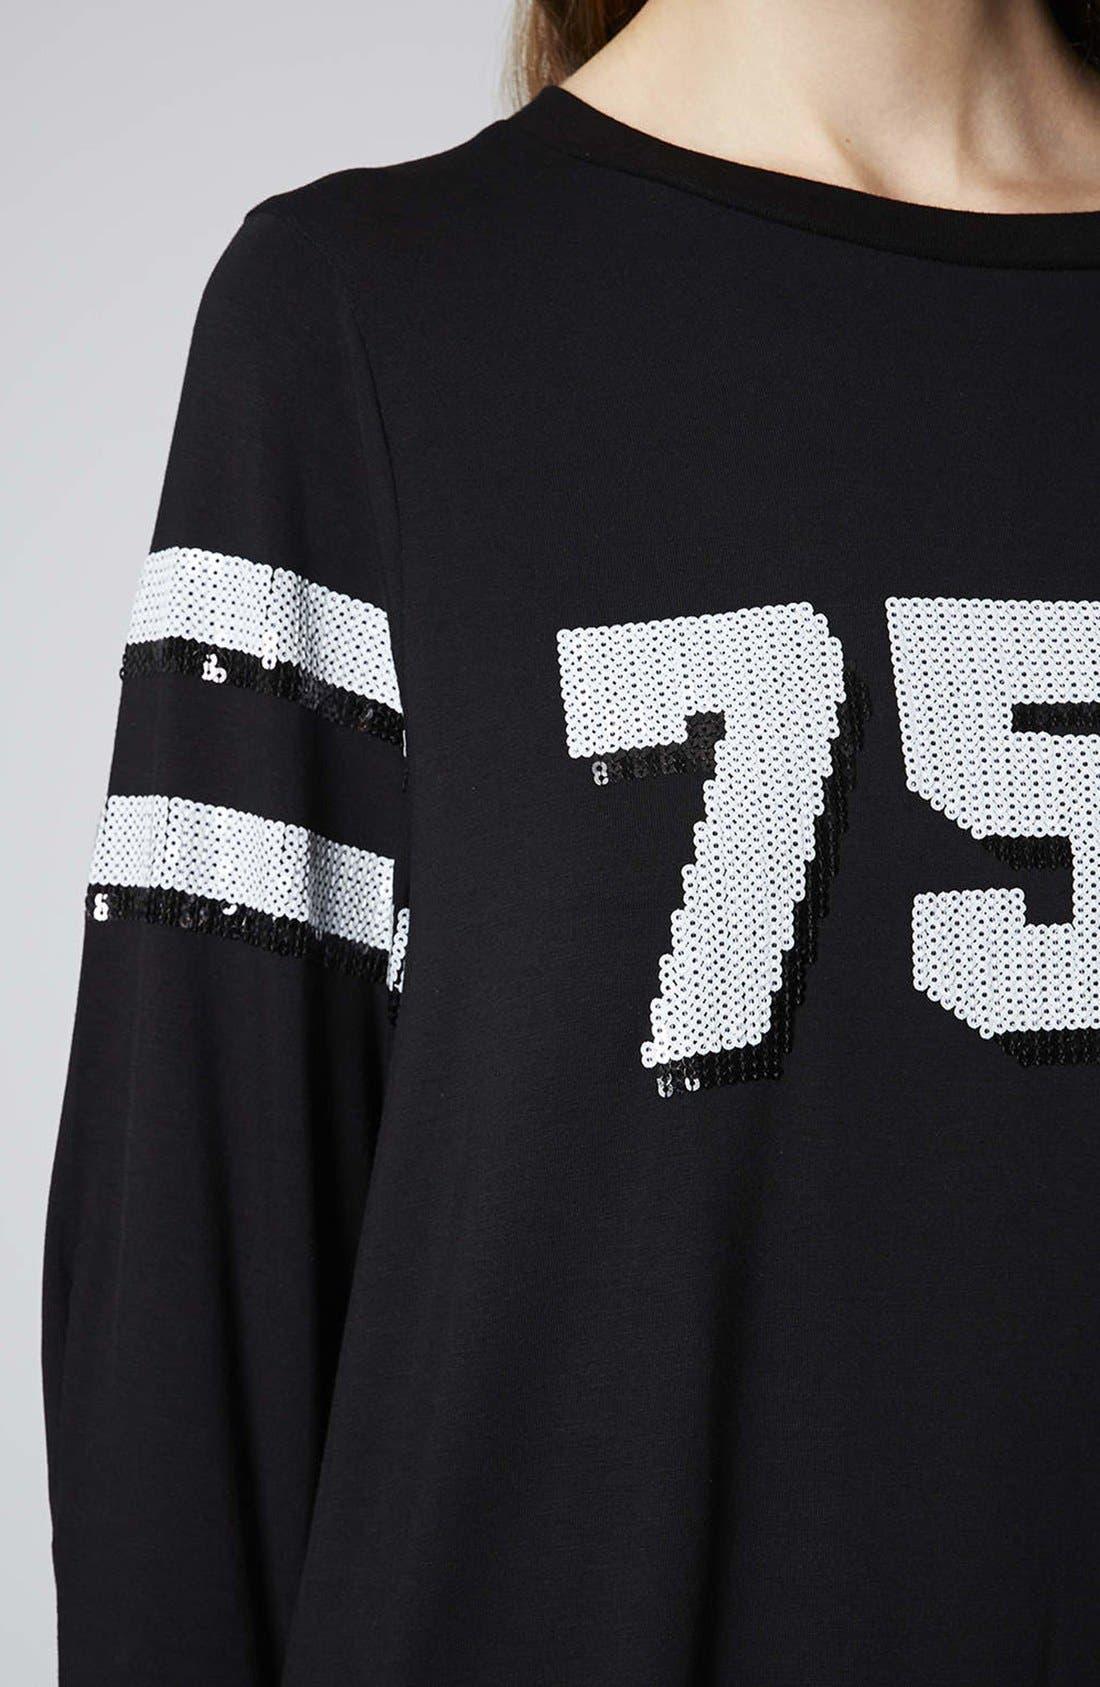 TOPSHOP,                             '750' Sequin Tunic,                             Alternate thumbnail 4, color,                             001